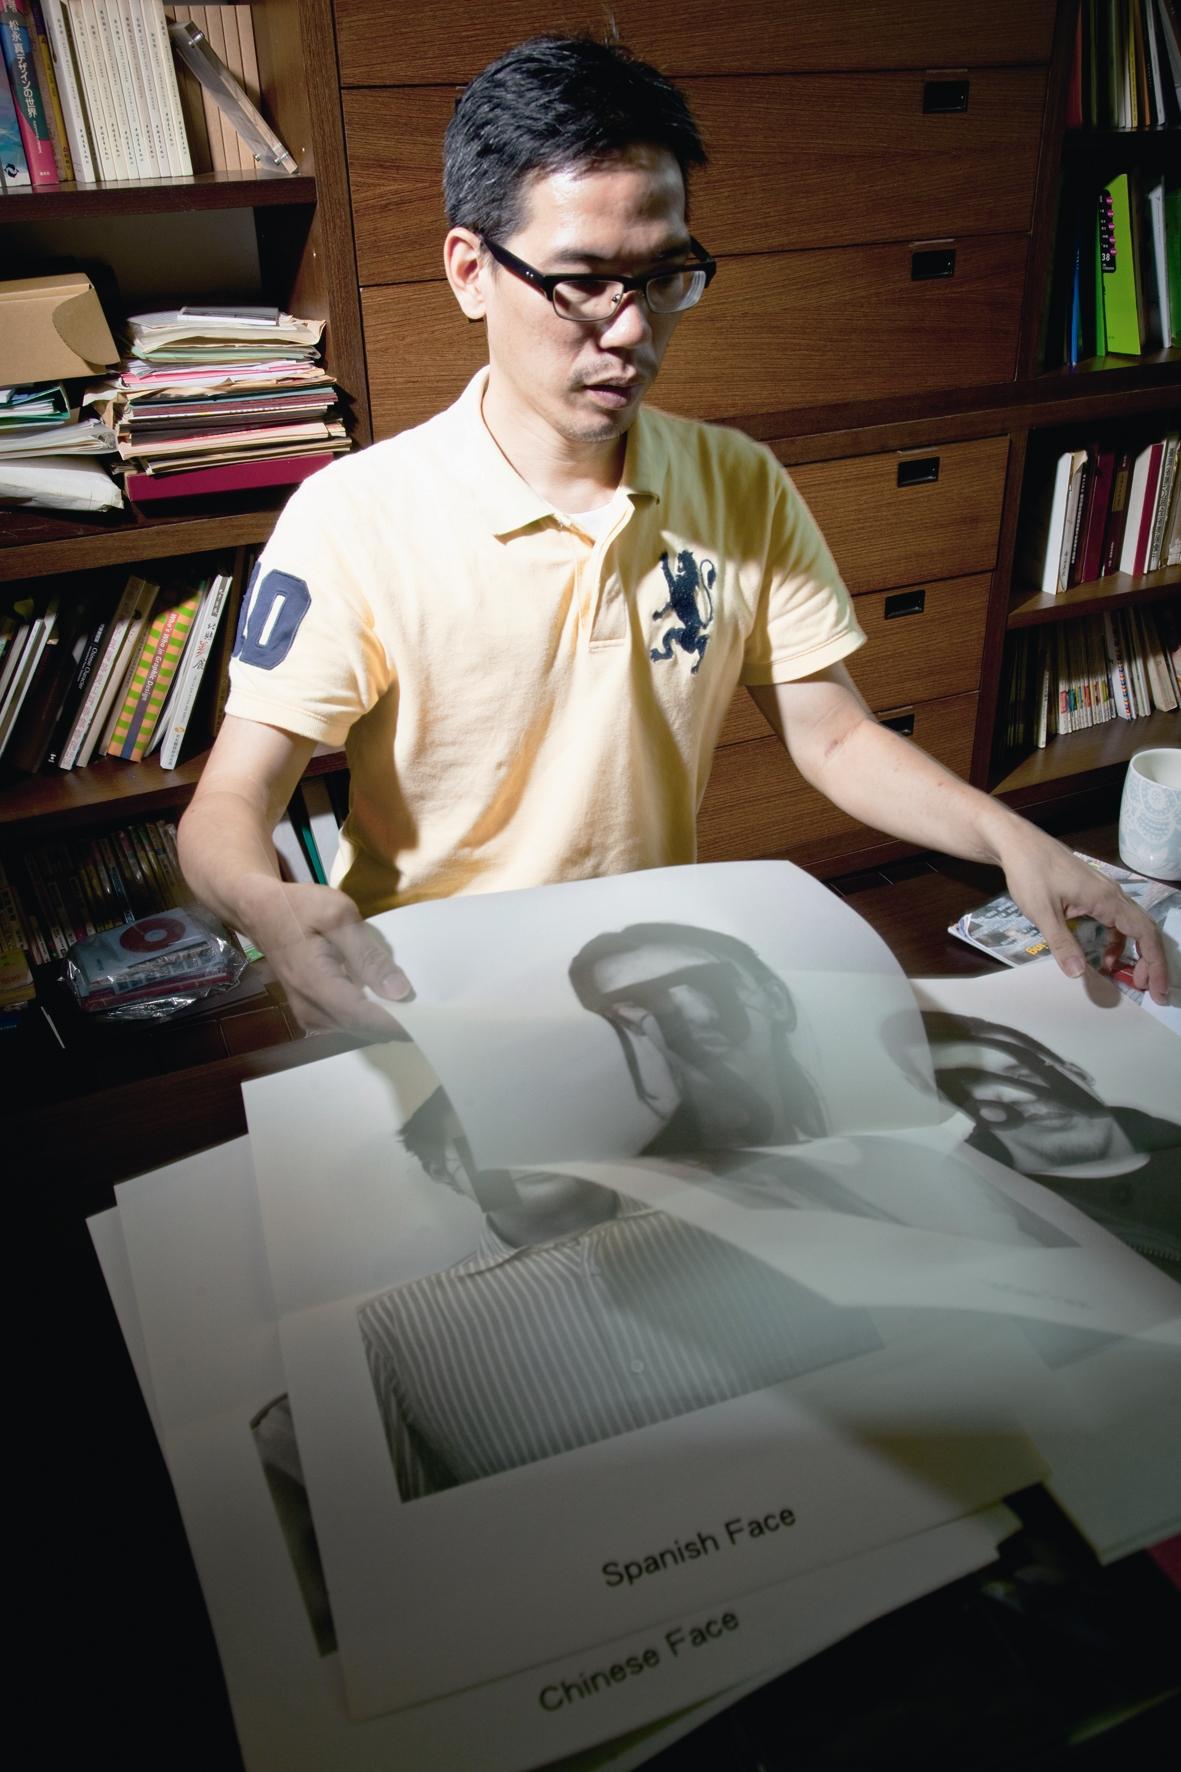 CJ STUDIO主持人陸希傑認為,設計就是一種語言與溝通,愈多的